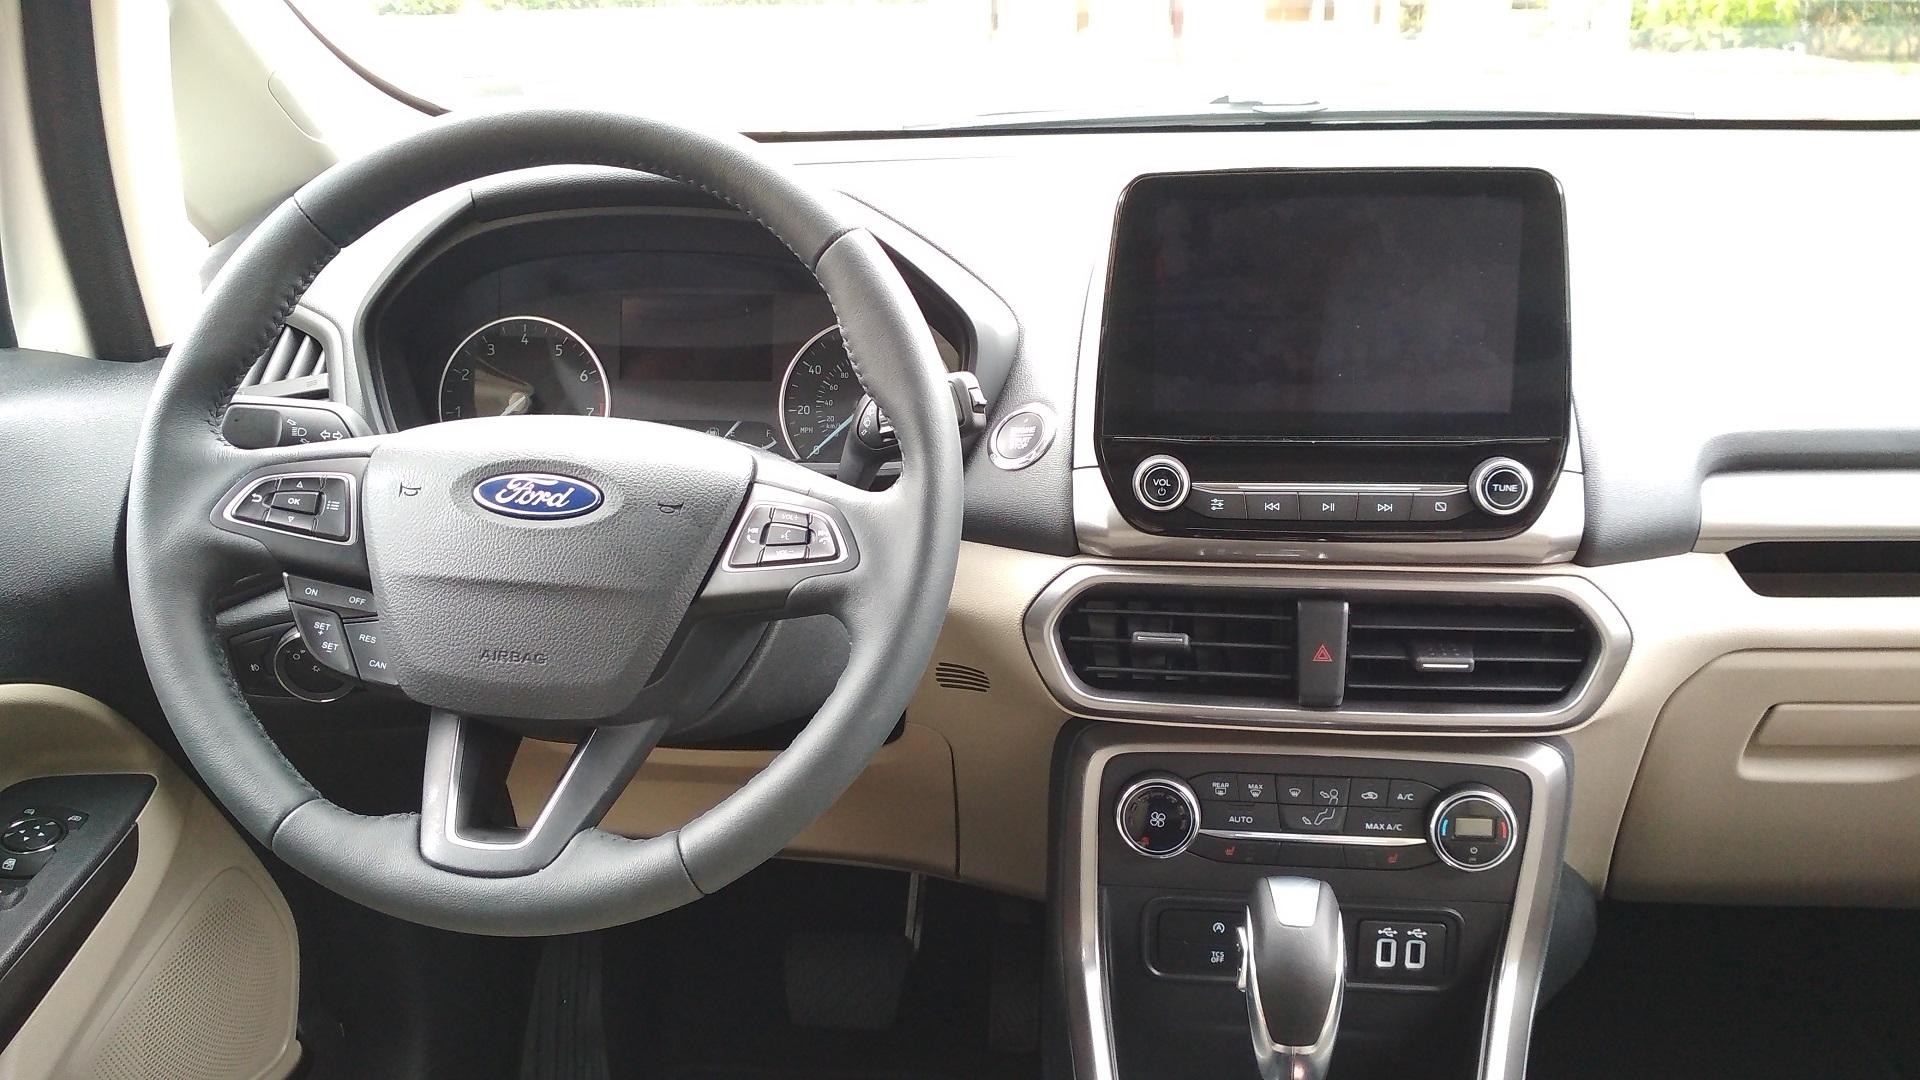 Ford EcoSport?-2019_ford_ecosport-7-.jpg